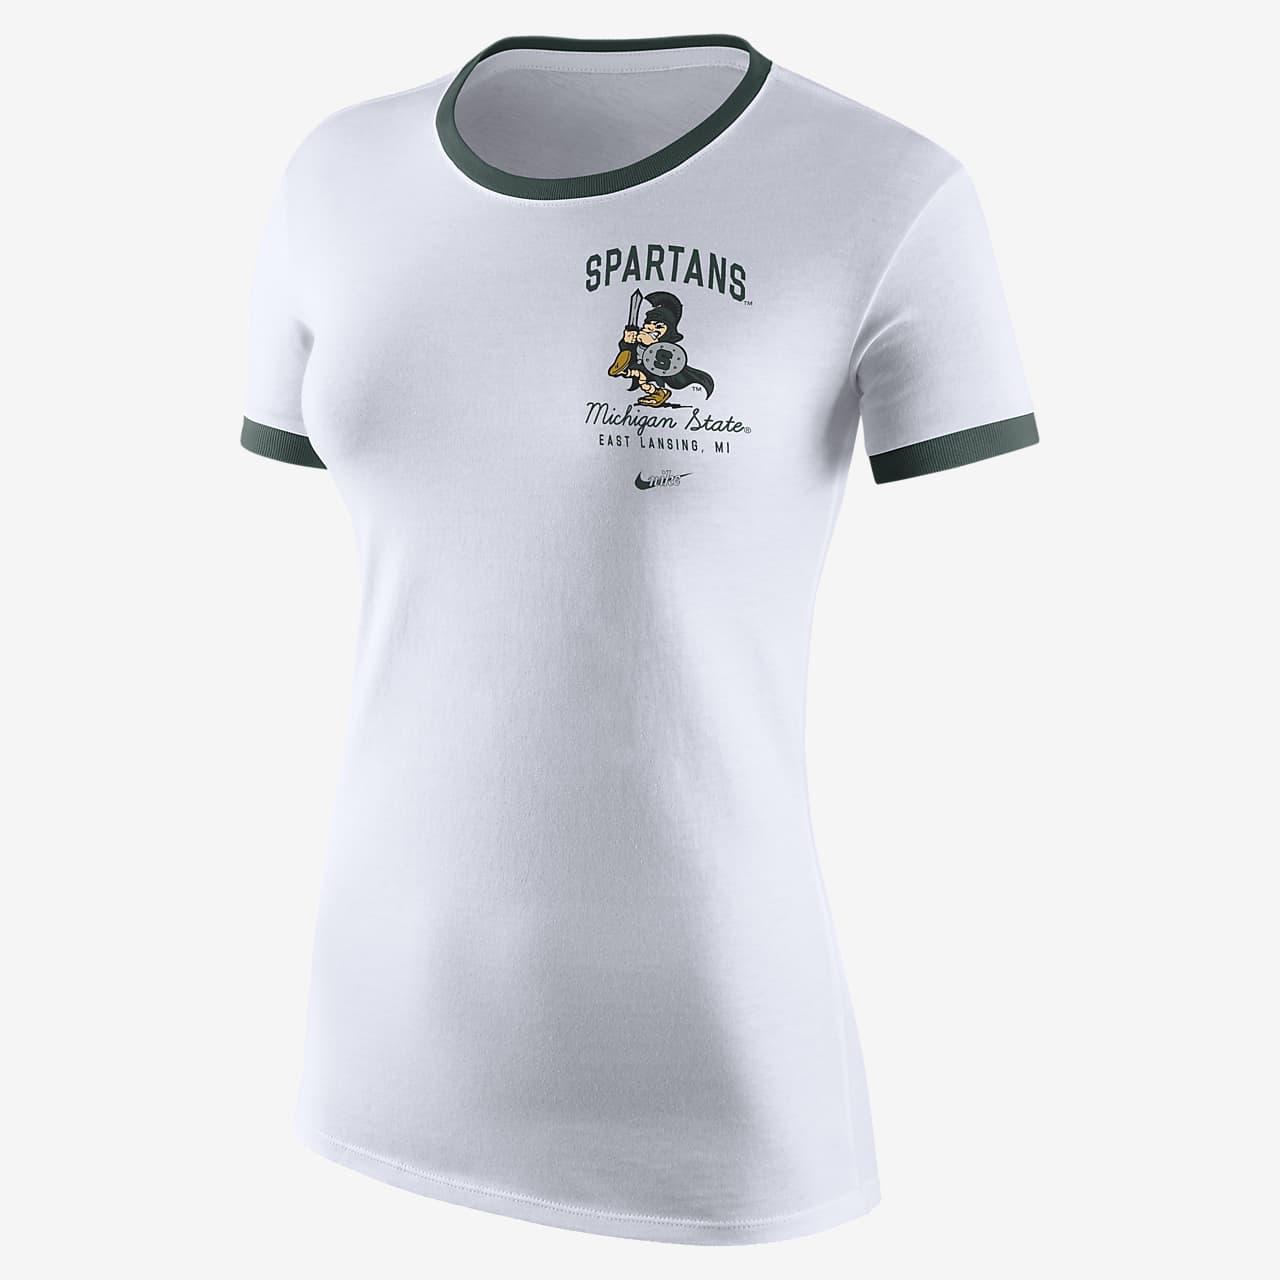 Nike College (Michigan State) Women's T-Shirt